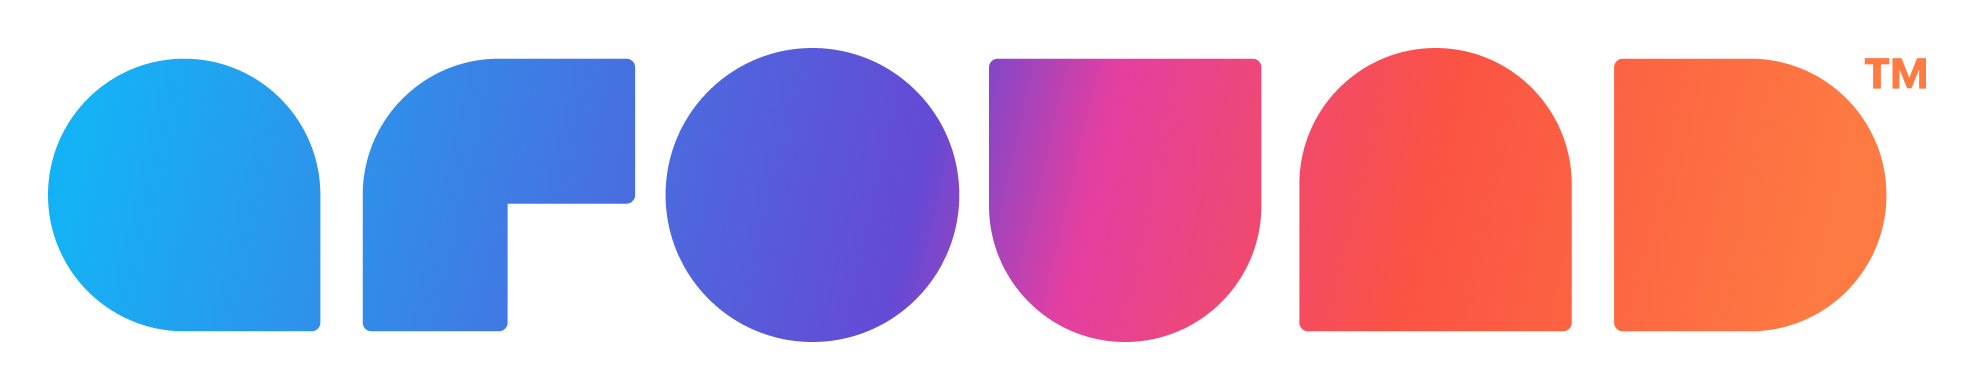 Around logo